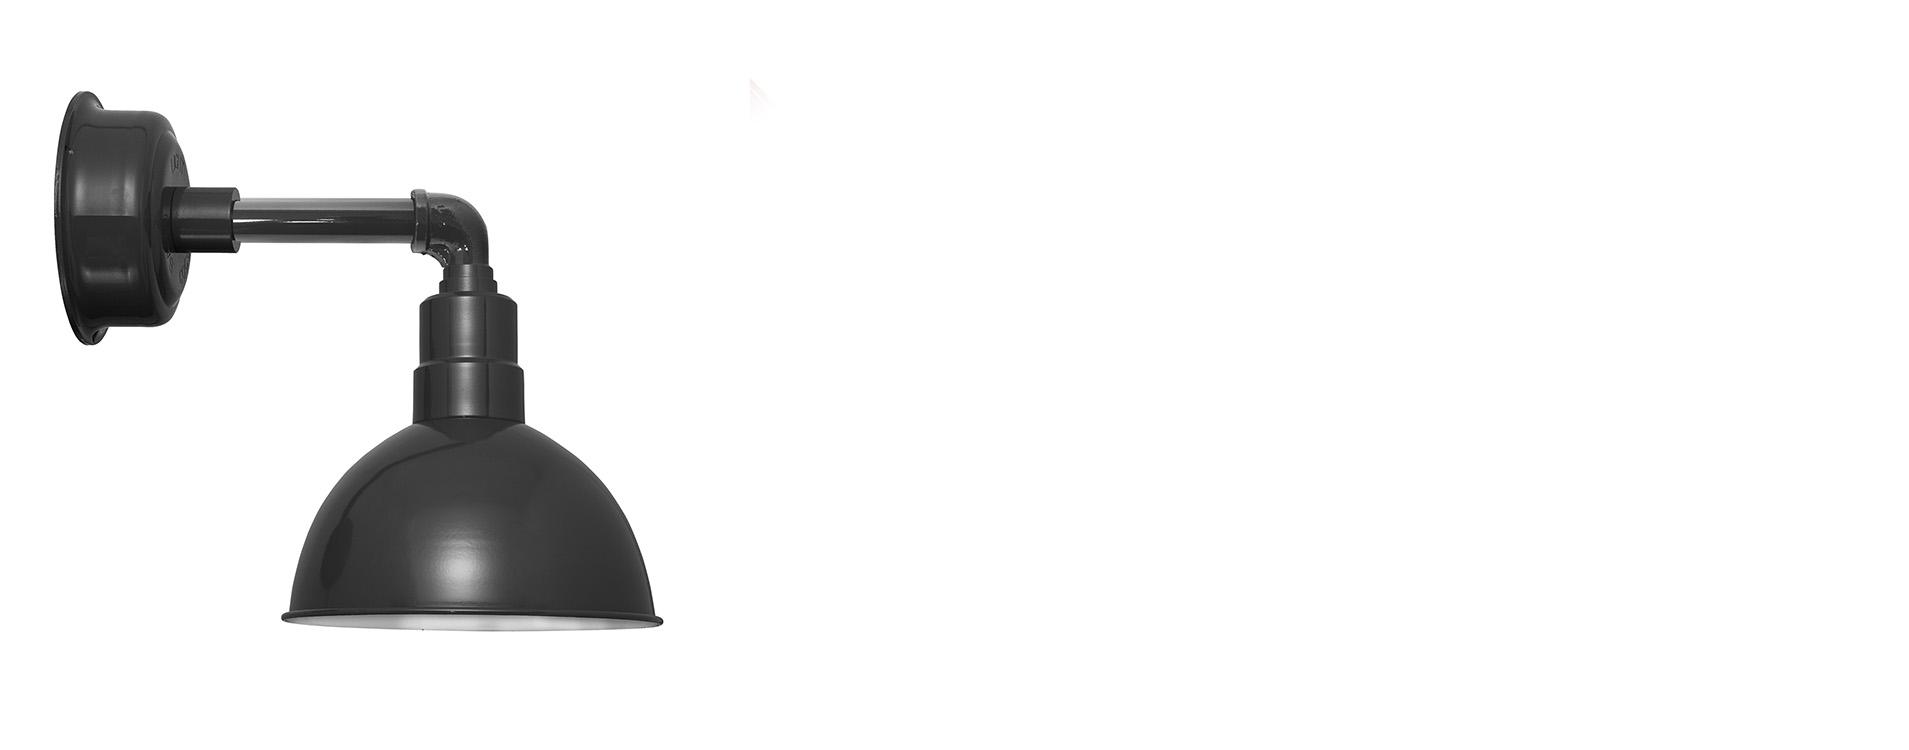 Blackspot LED Wall Sconce